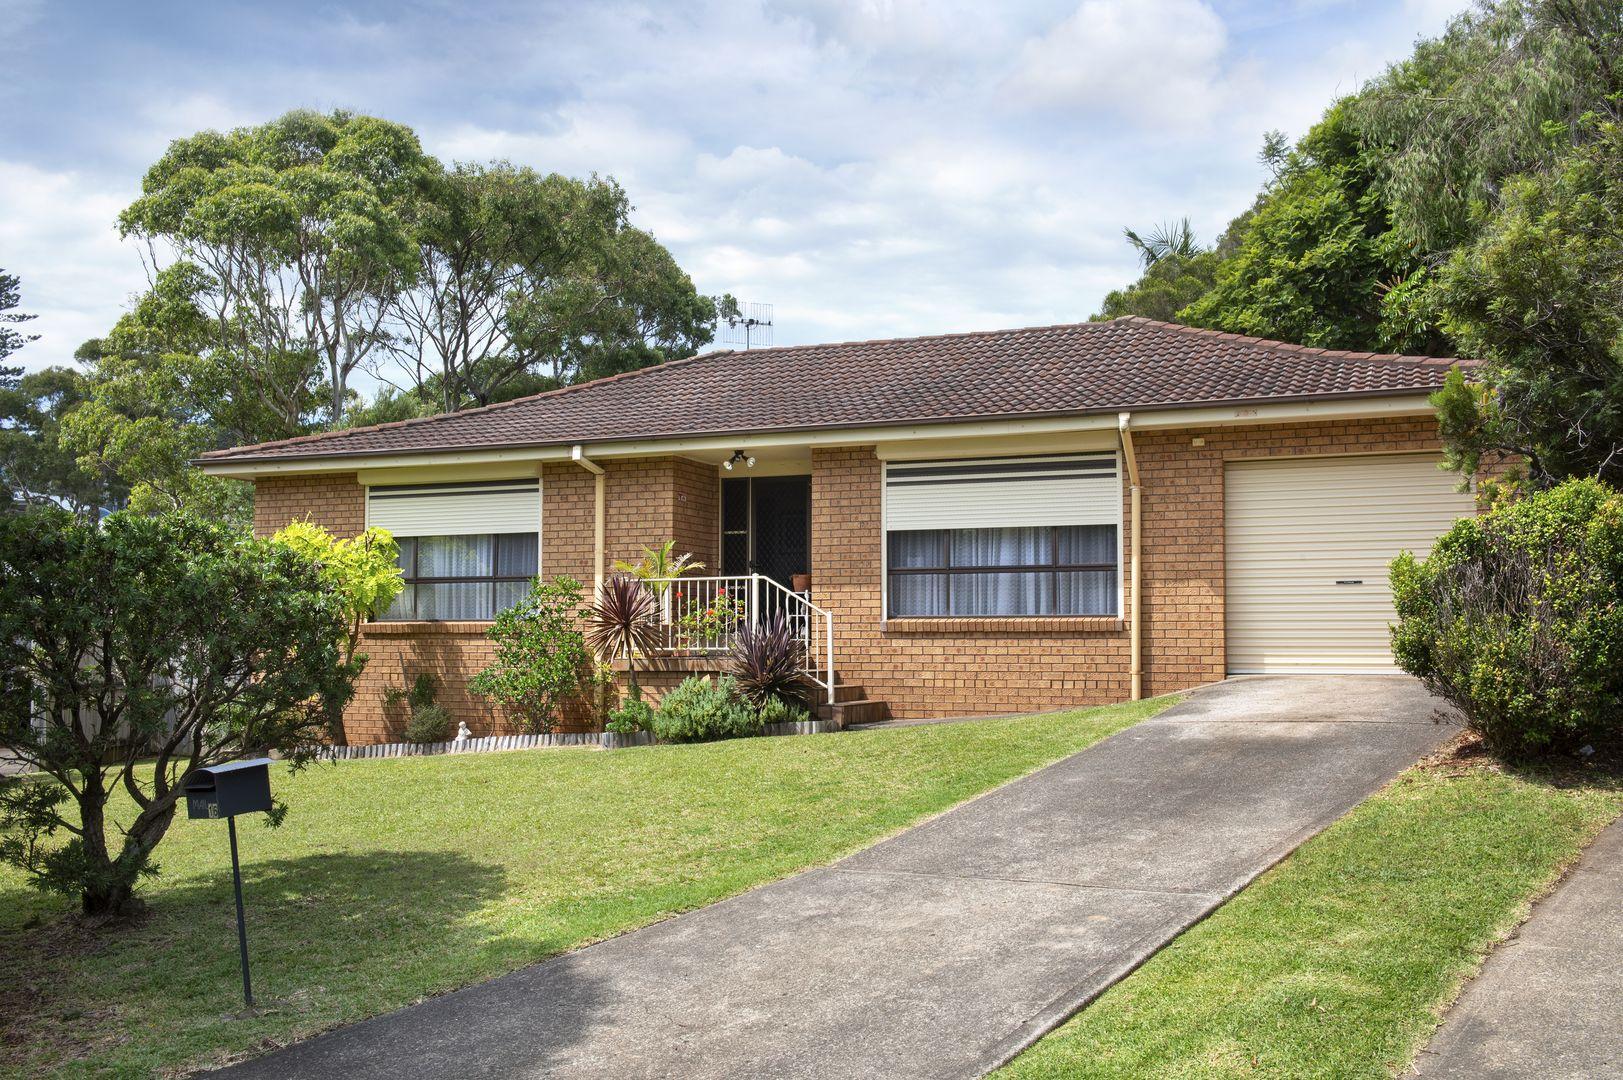 16 Chittick Place, Gerringong NSW 2534, Image 0